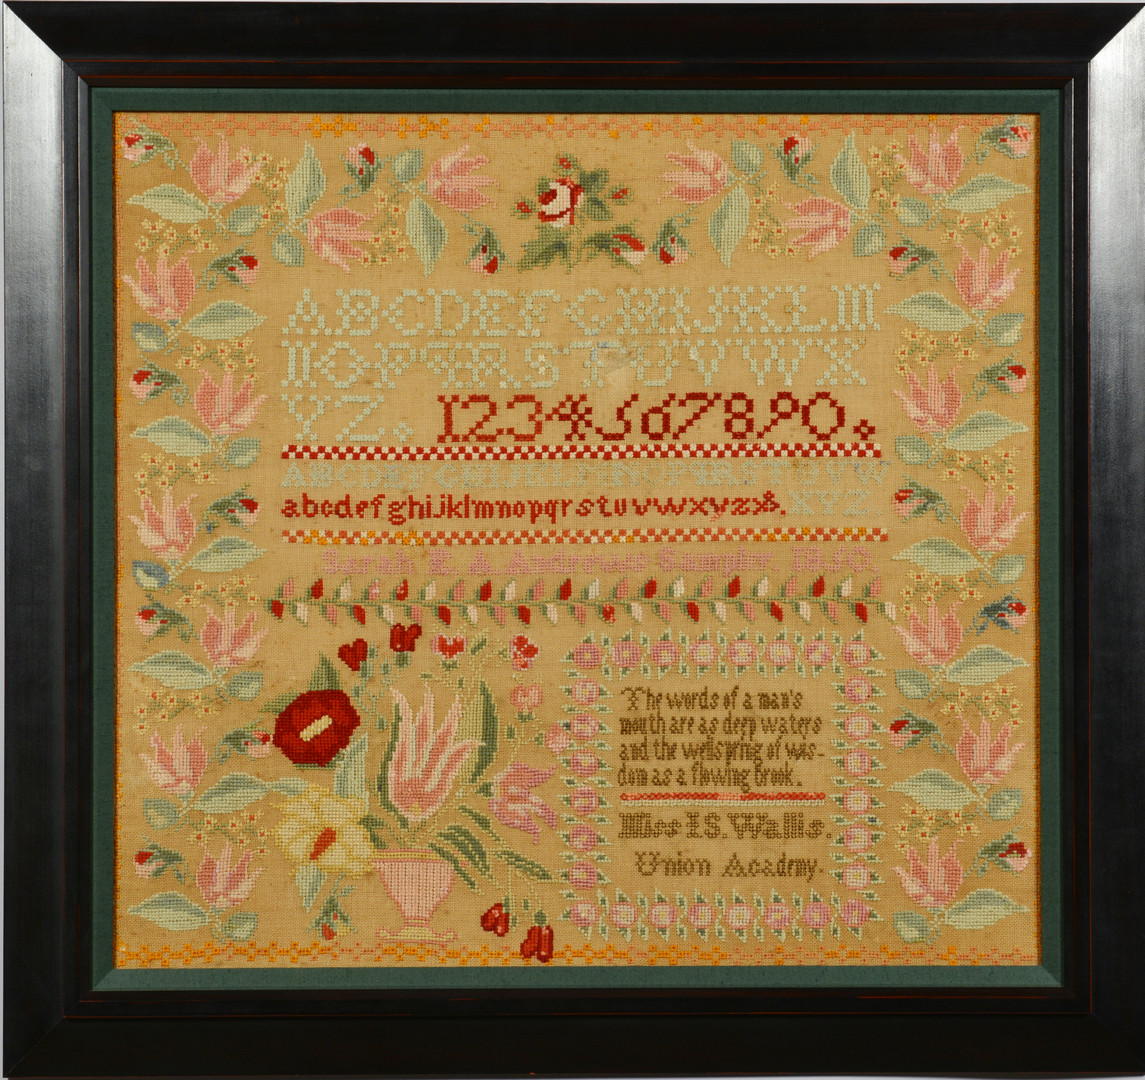 Lot 166: Tennessee Needlework Sampler 1850, Sarah Andrews